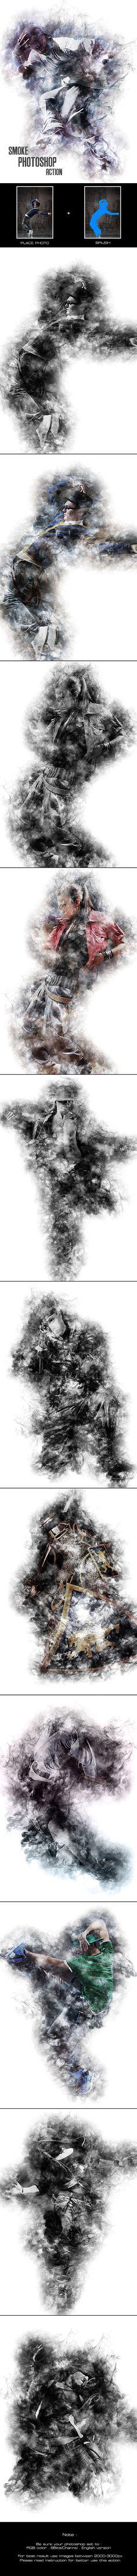 Smoke - Photoshop Action #photoeffect Download: http://graphicriver.net/item/smoke-photoshop-action/12875547?ref=ksioks